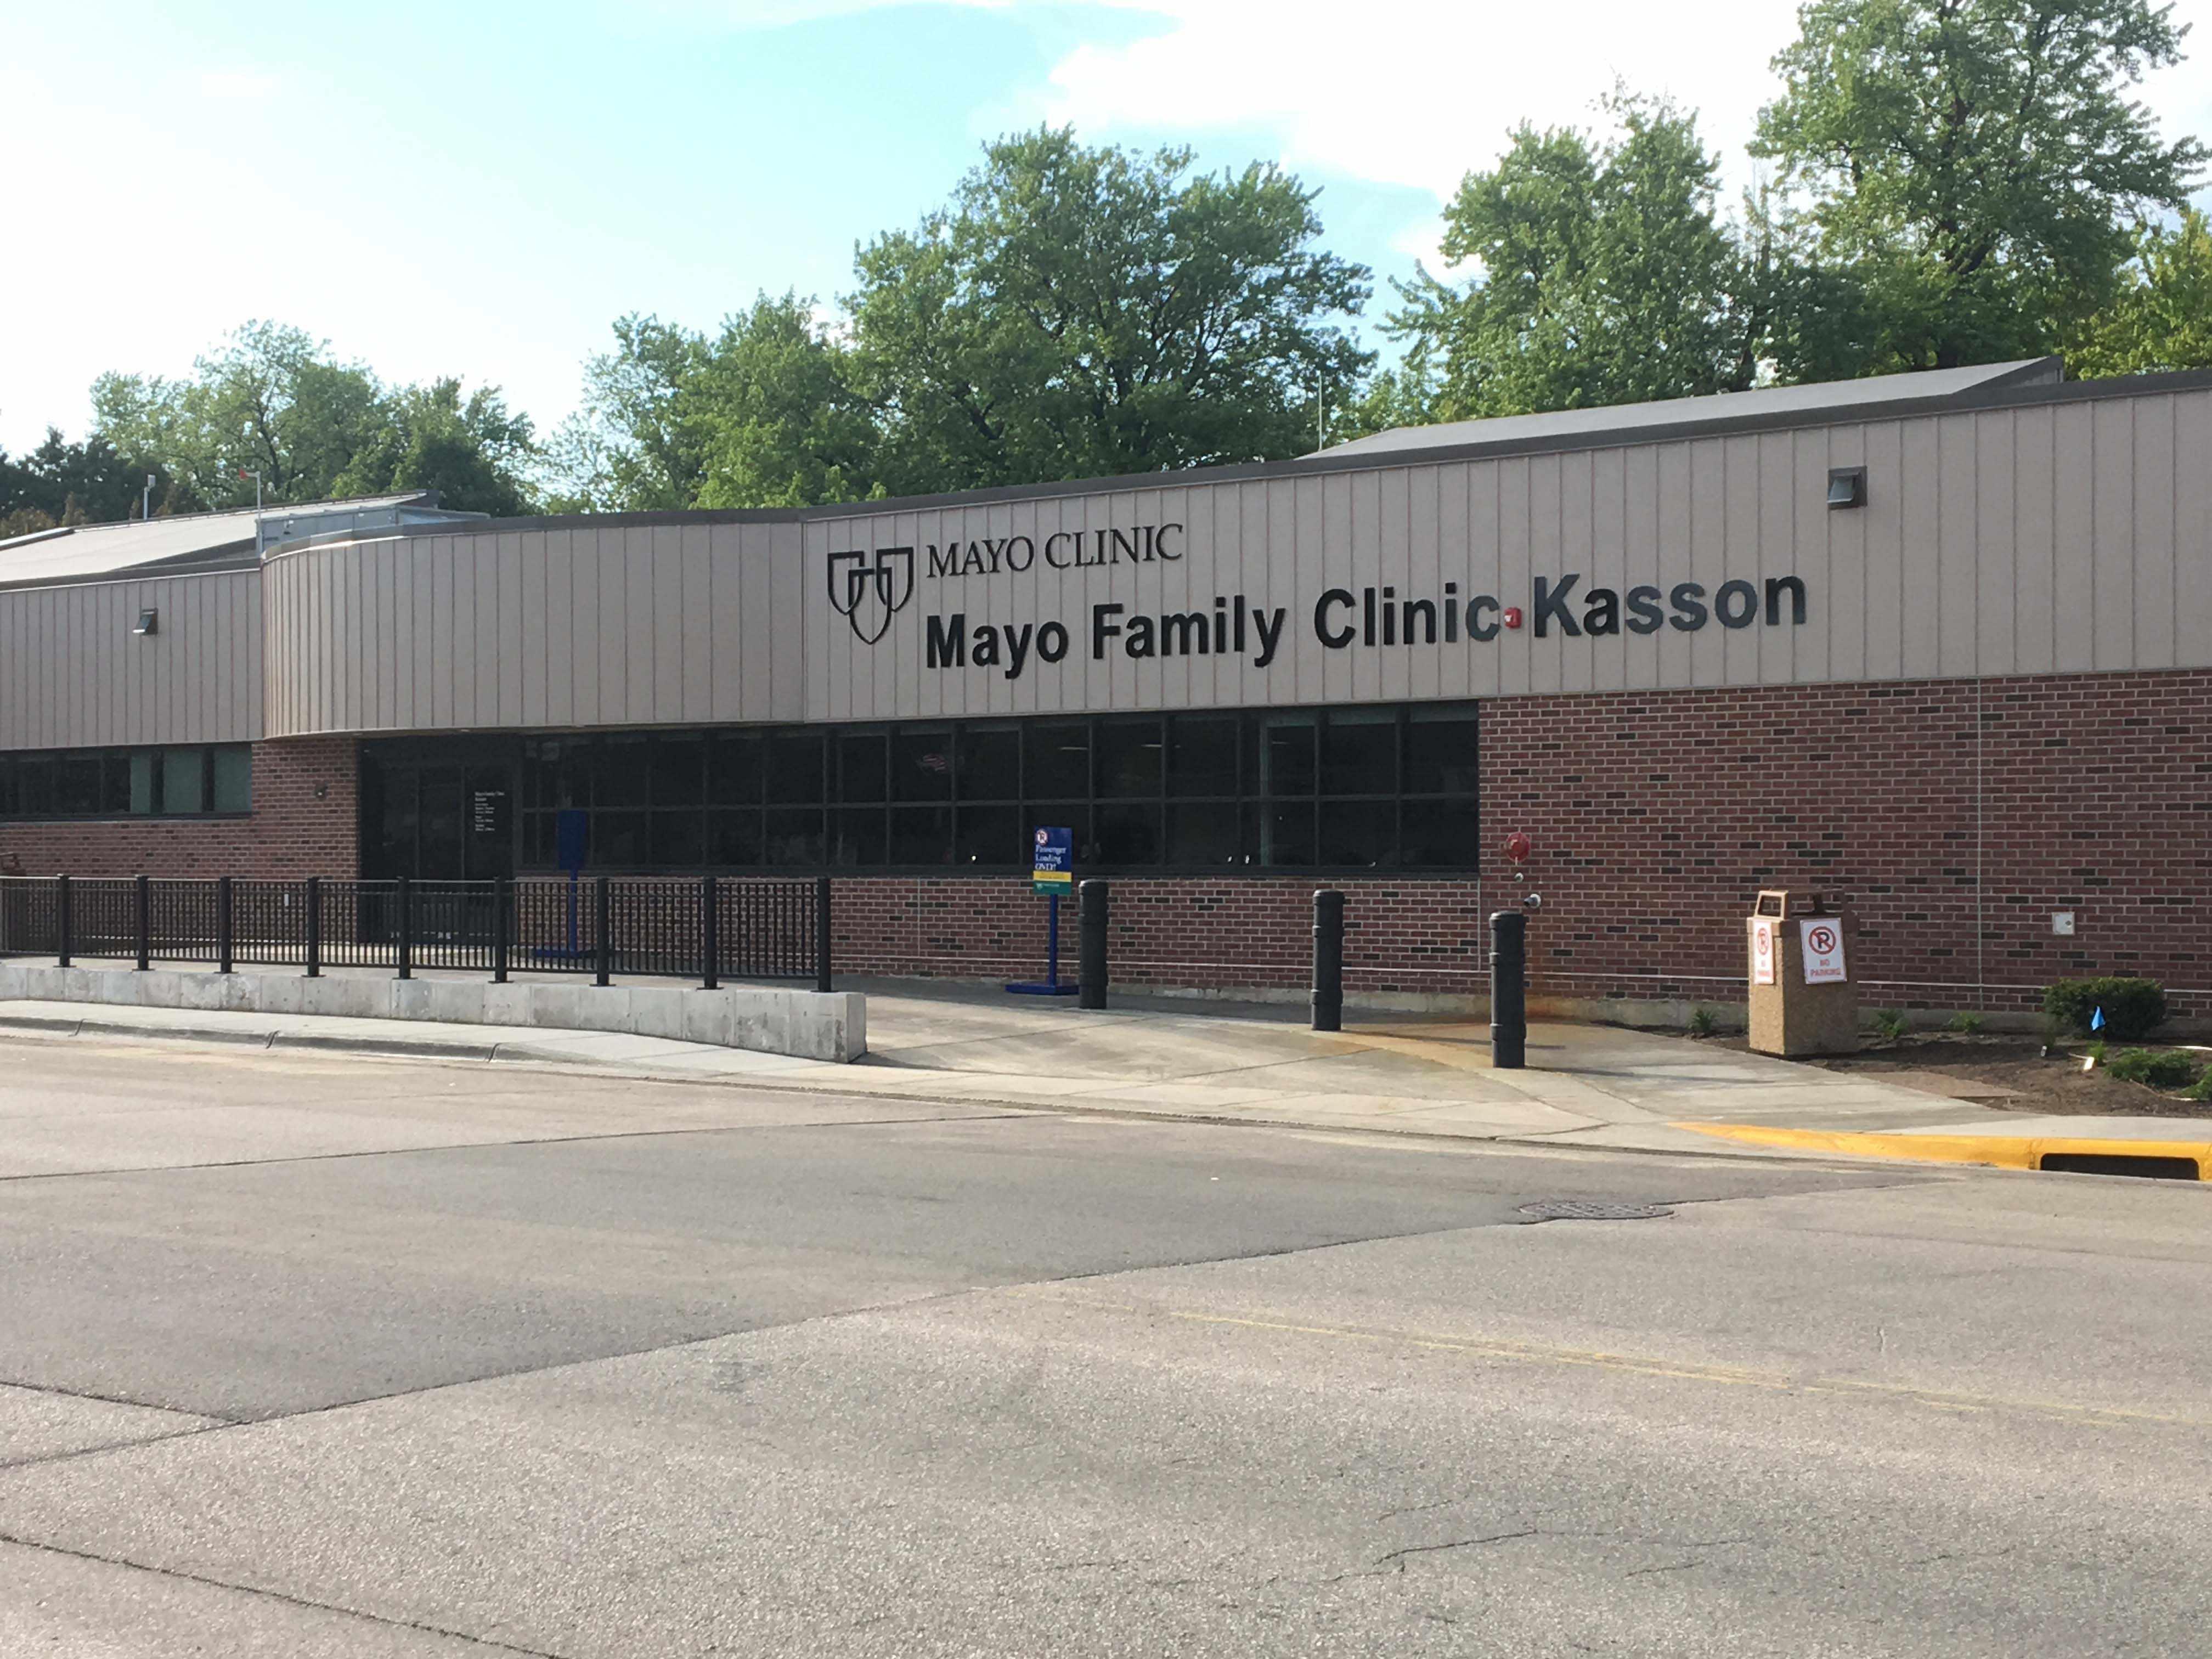 Tour Newly Renovated Mayo Family Clinic Kasson on June 21 – Mayo